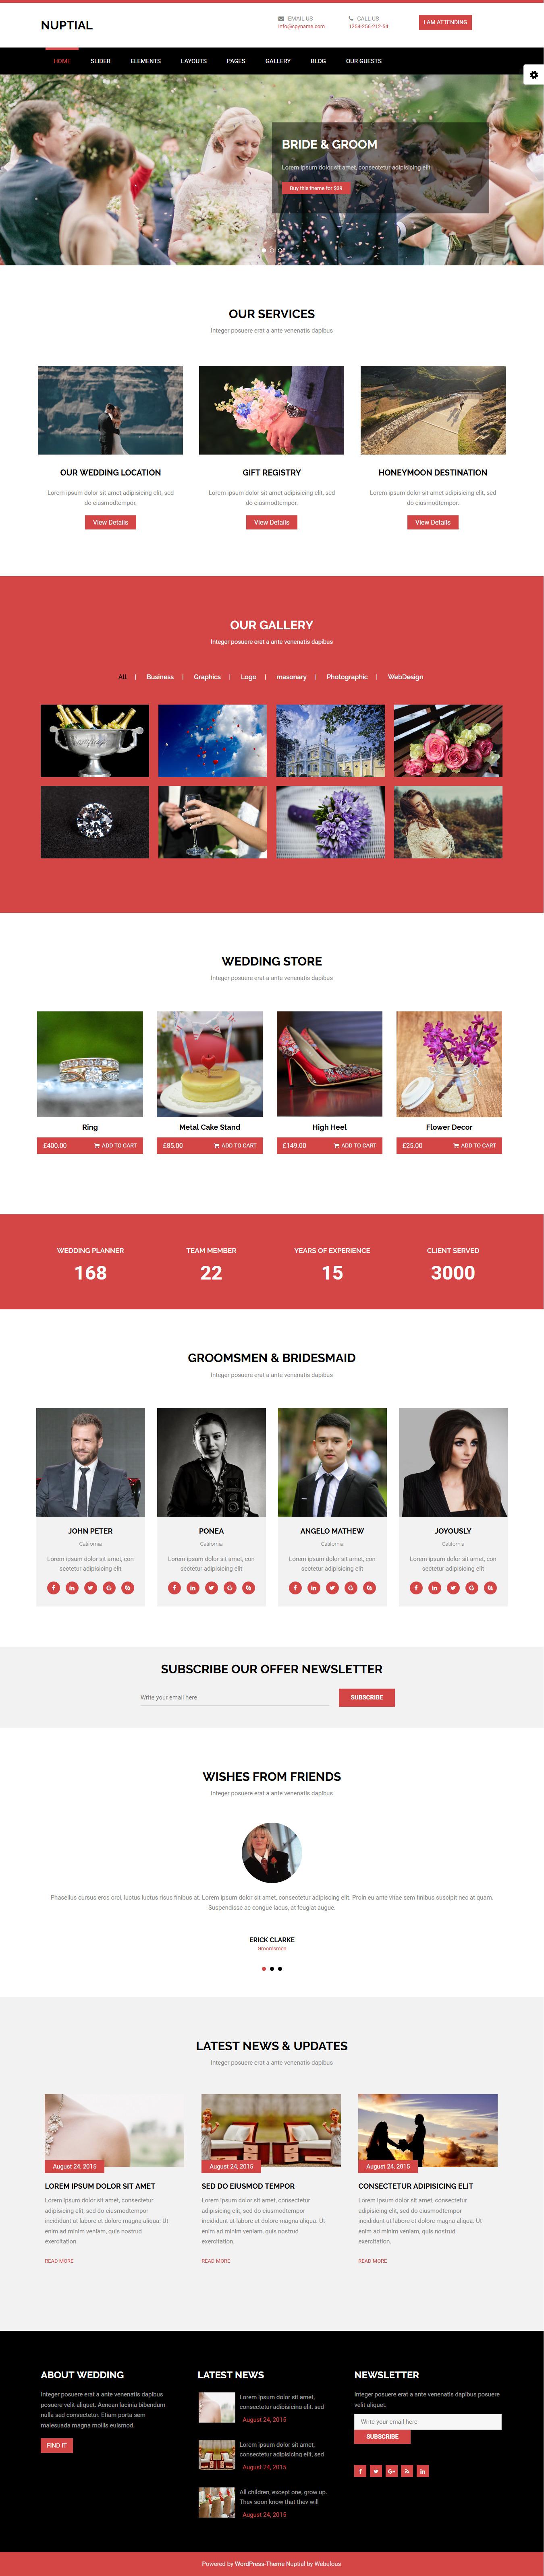 nuptial best free wedding wordpress theme 1 - 10+ Best Free Wedding WordPress Themes